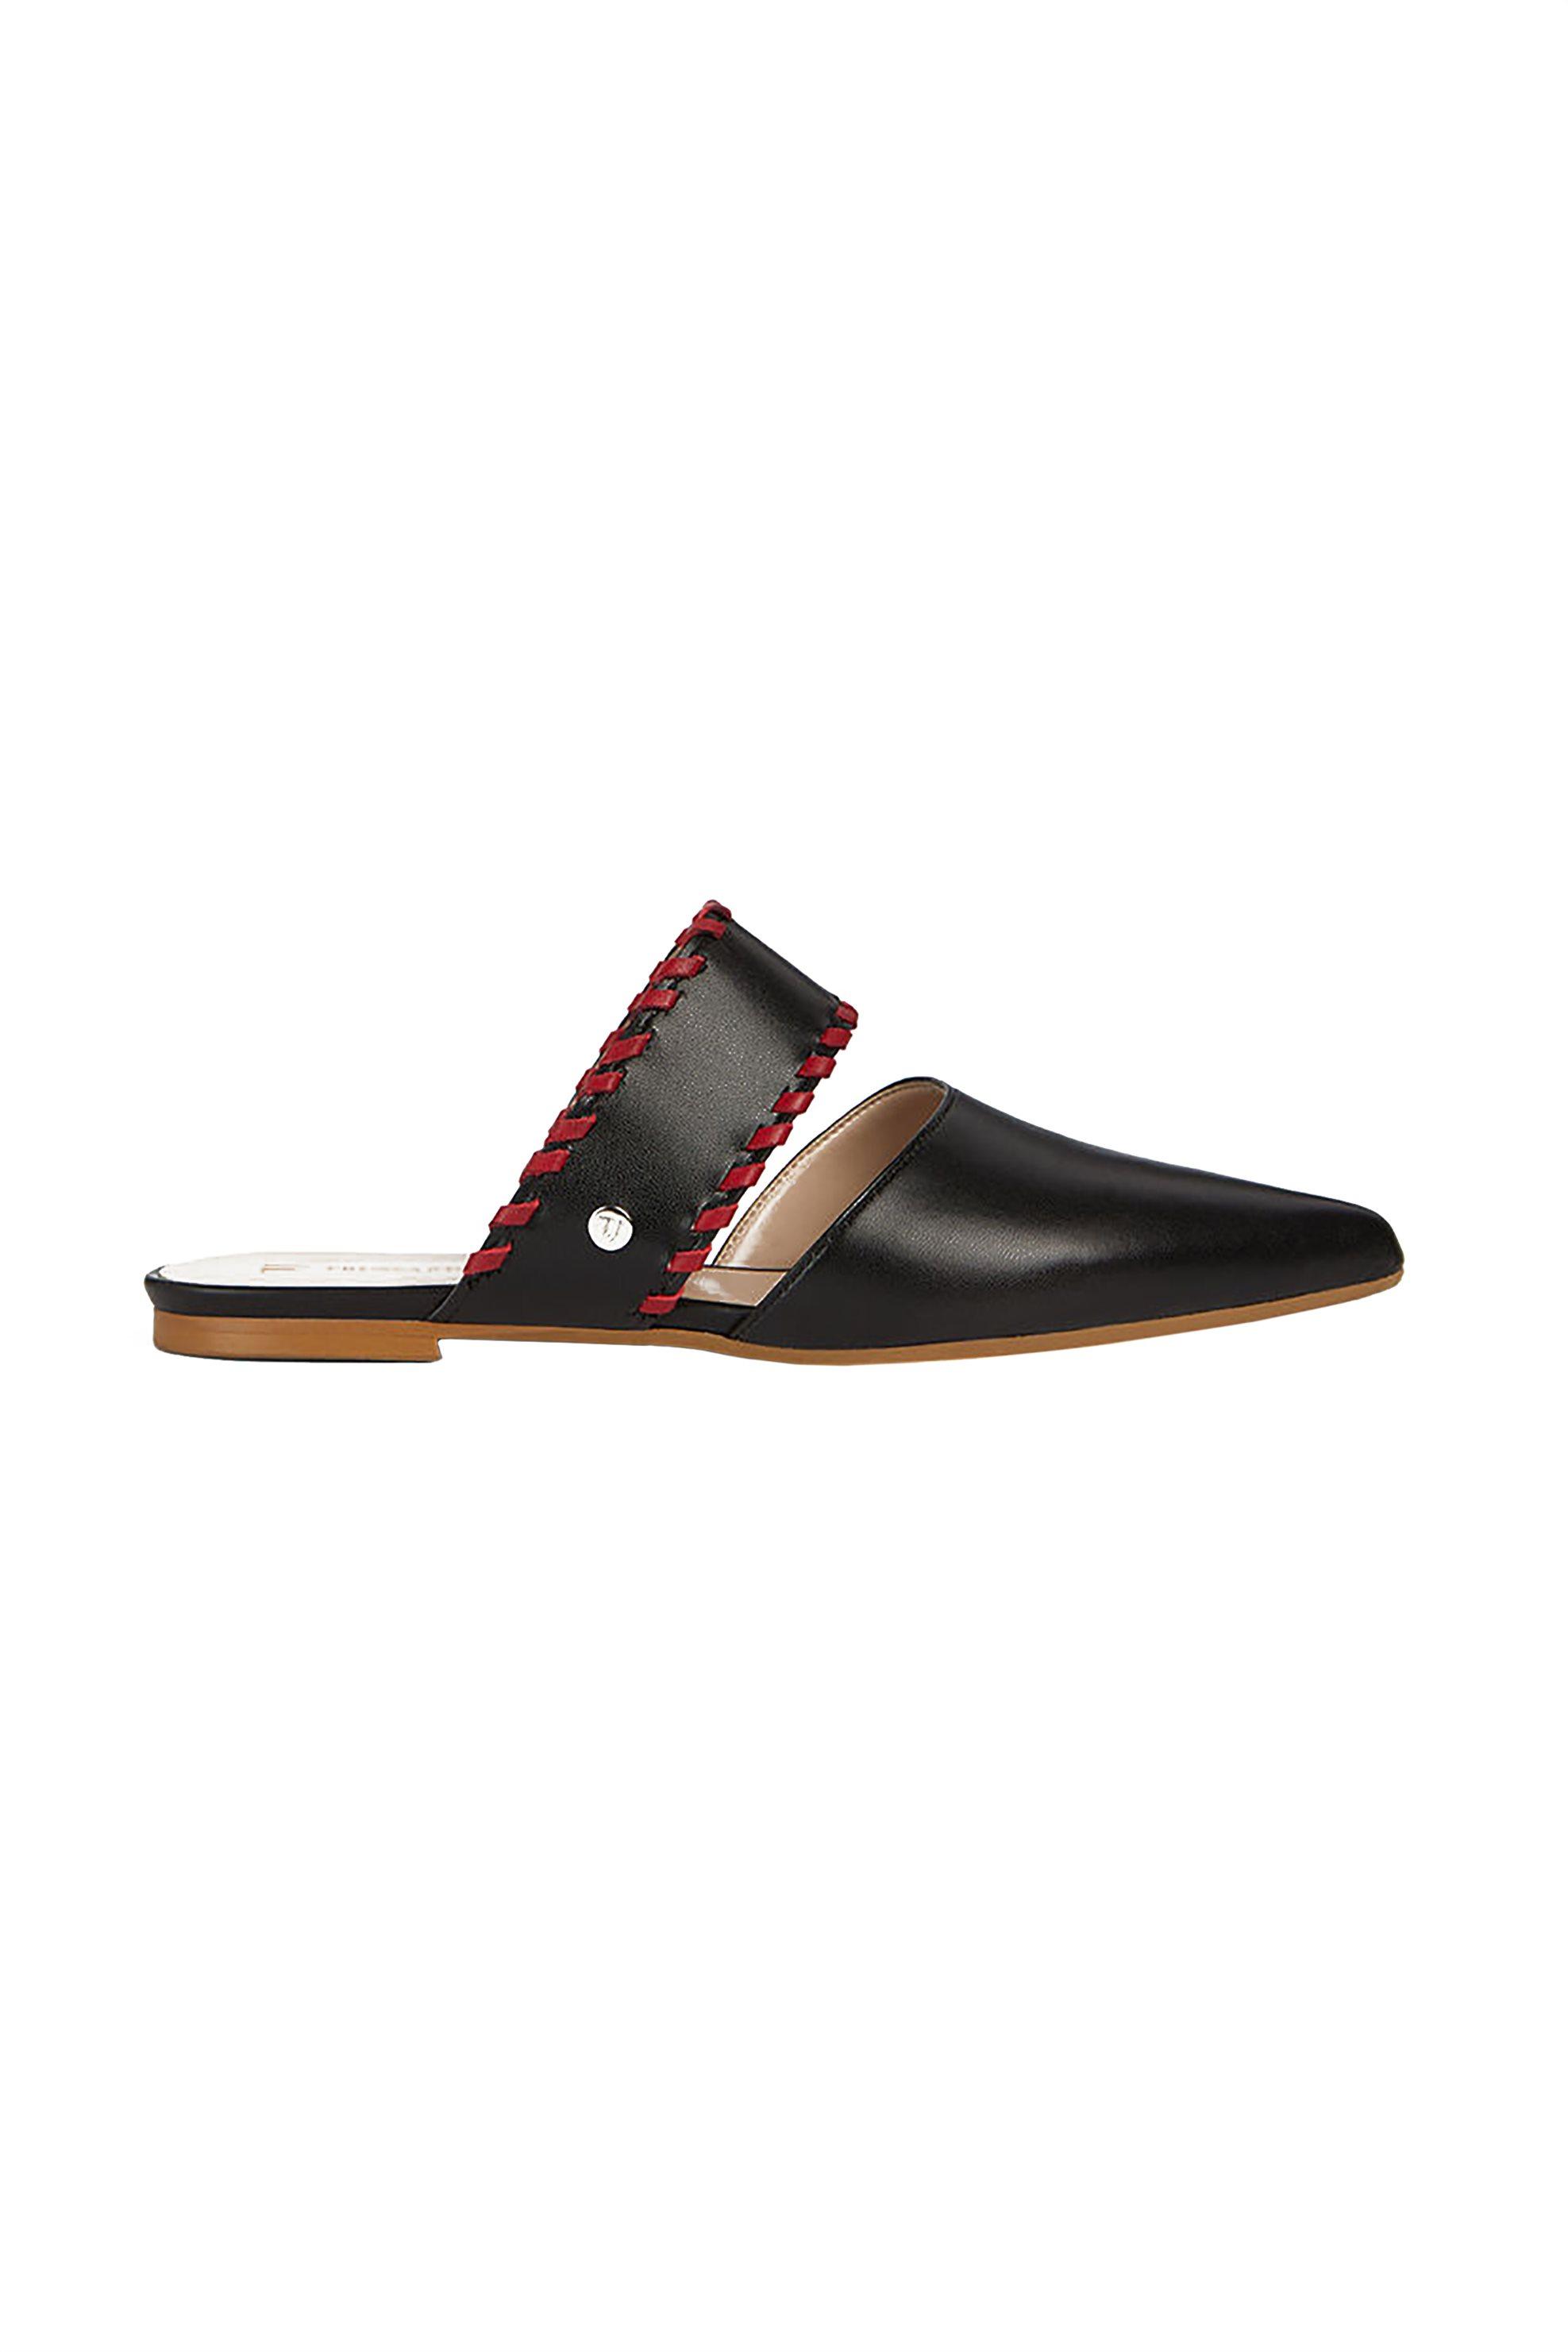 Trussardi Jeans γυναικεία παπούτσια flat mules – 79A00384-9Y099999 – Μαύρο